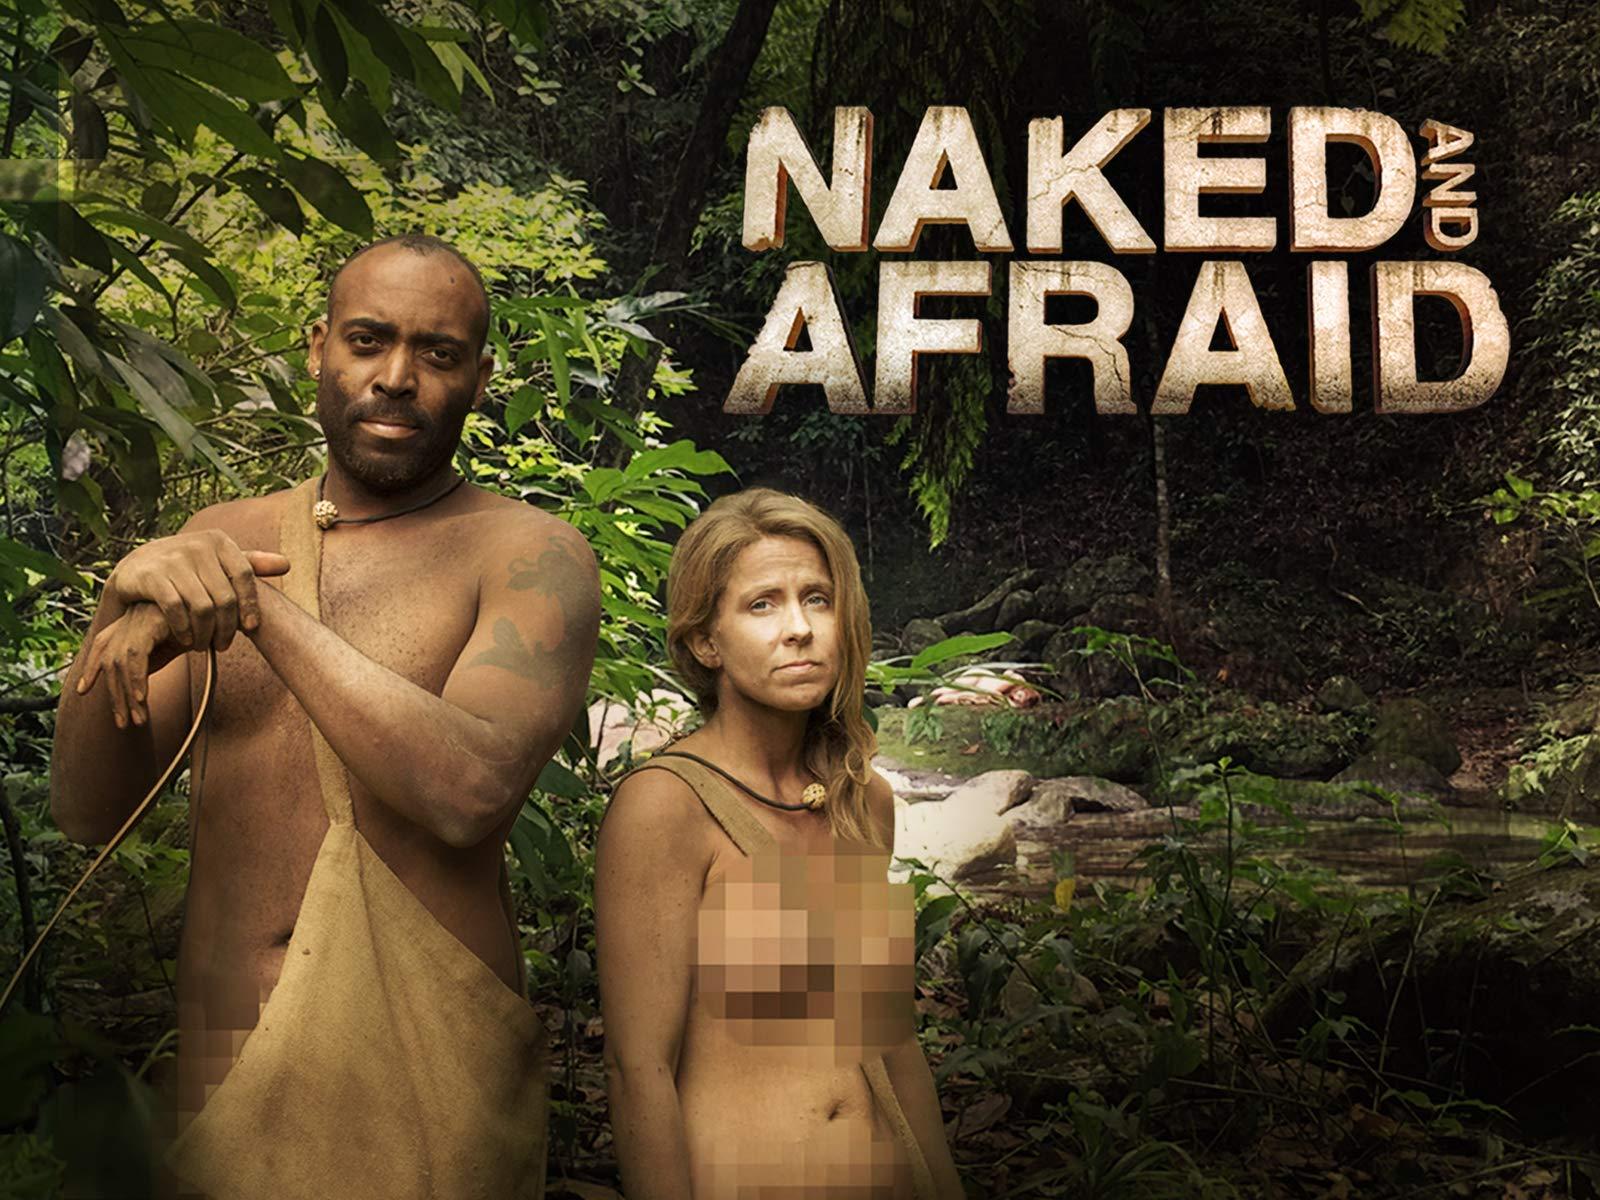 Nake and afraid nude women Watch Naked And Afraid Season 4 Prime Video